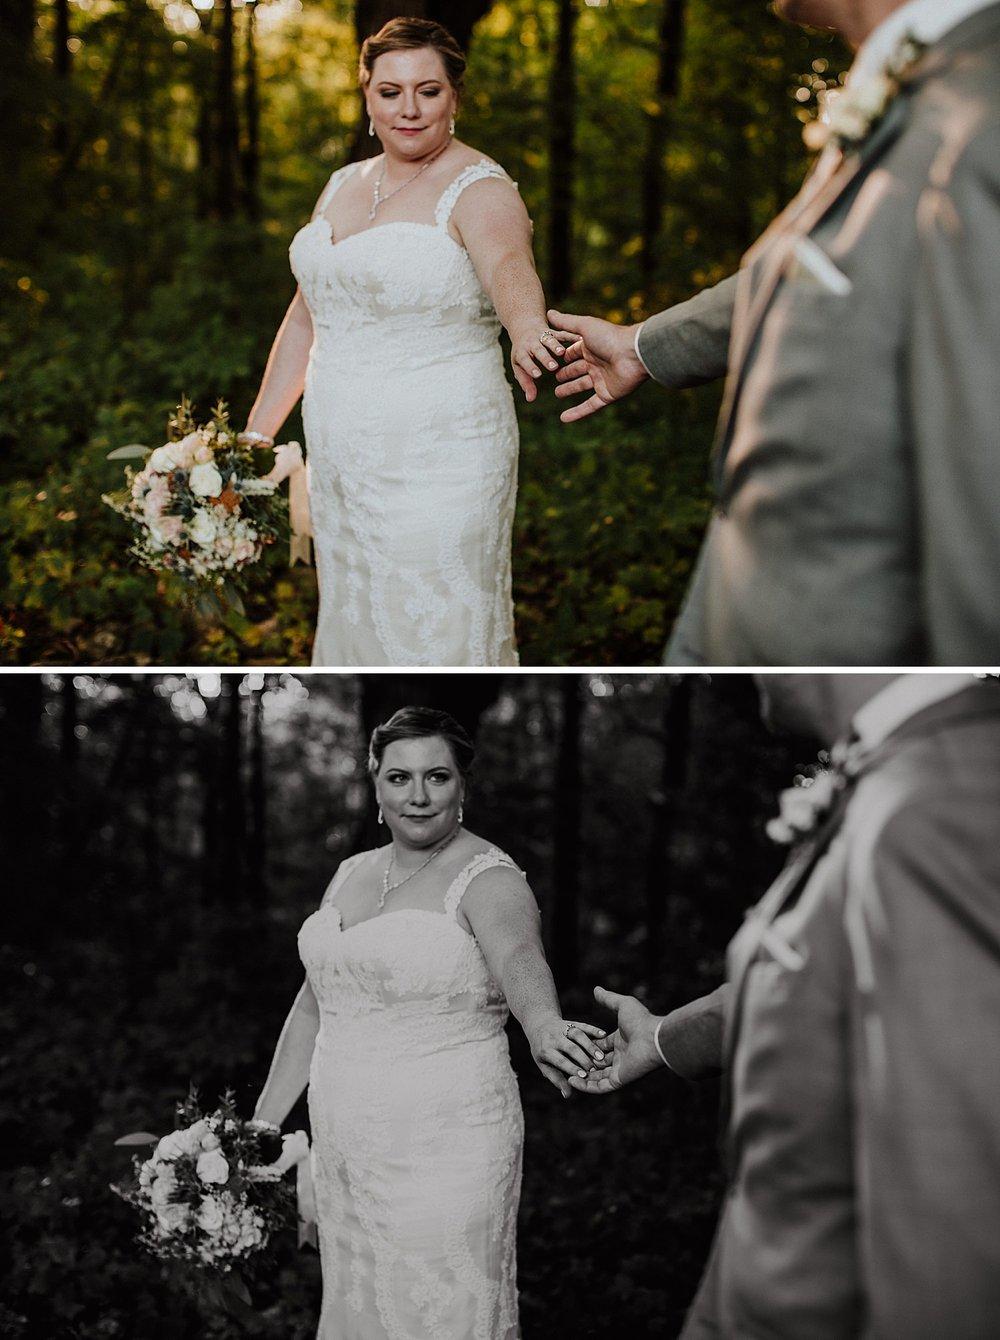 Terrace-167-Documentary-Wedding-Photographer_0028.jpg